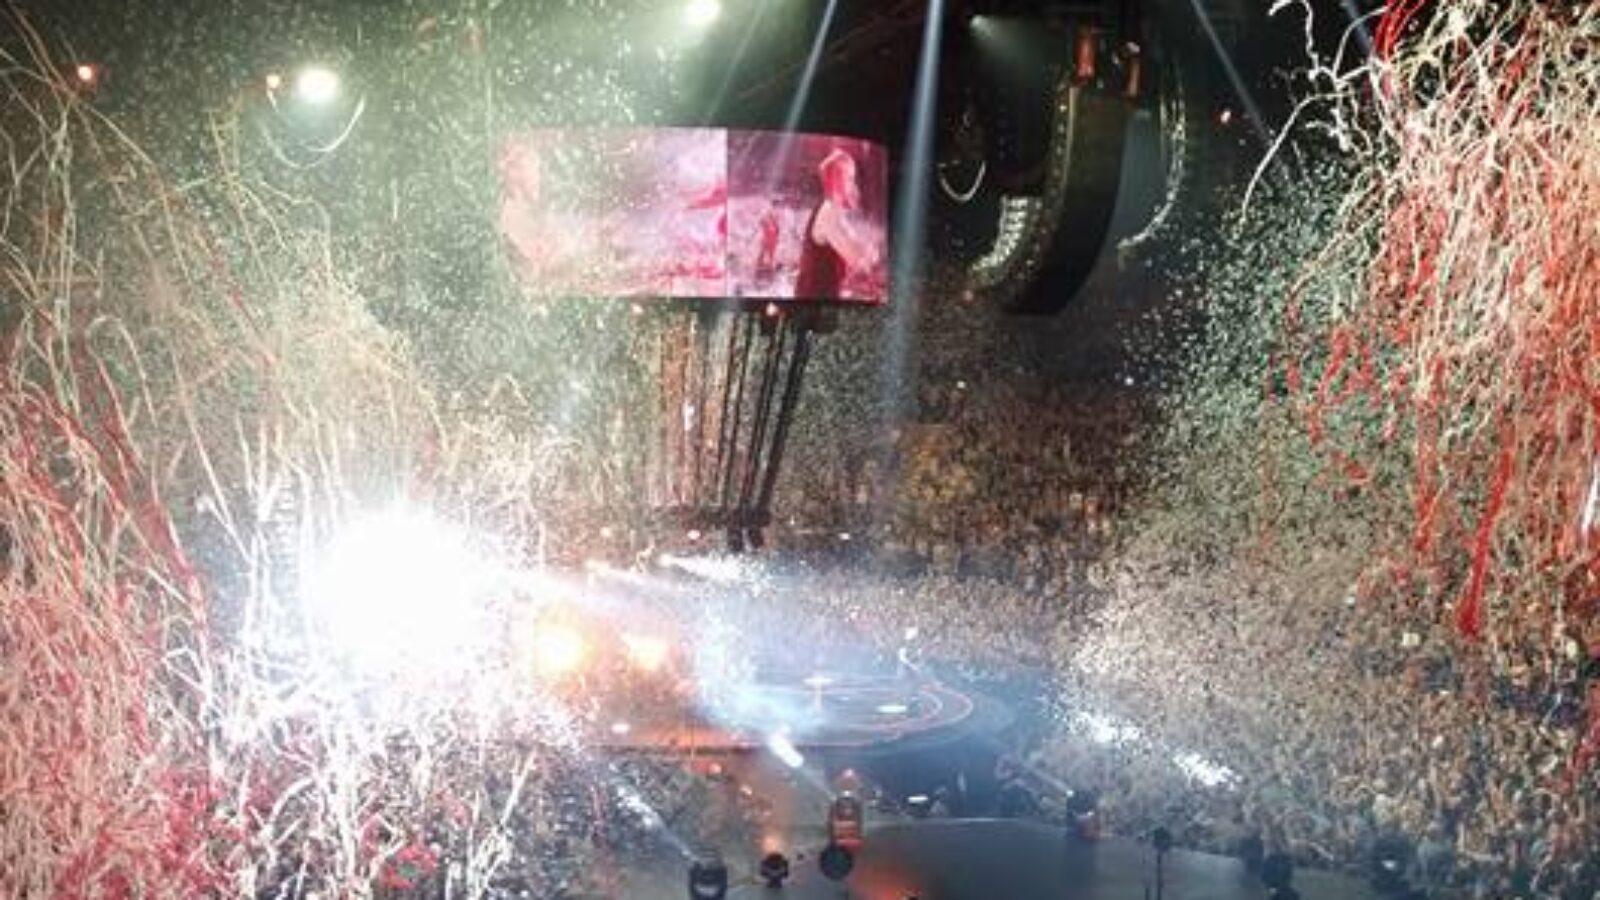 Muse am 6.6. in der Barclaycard-Arena